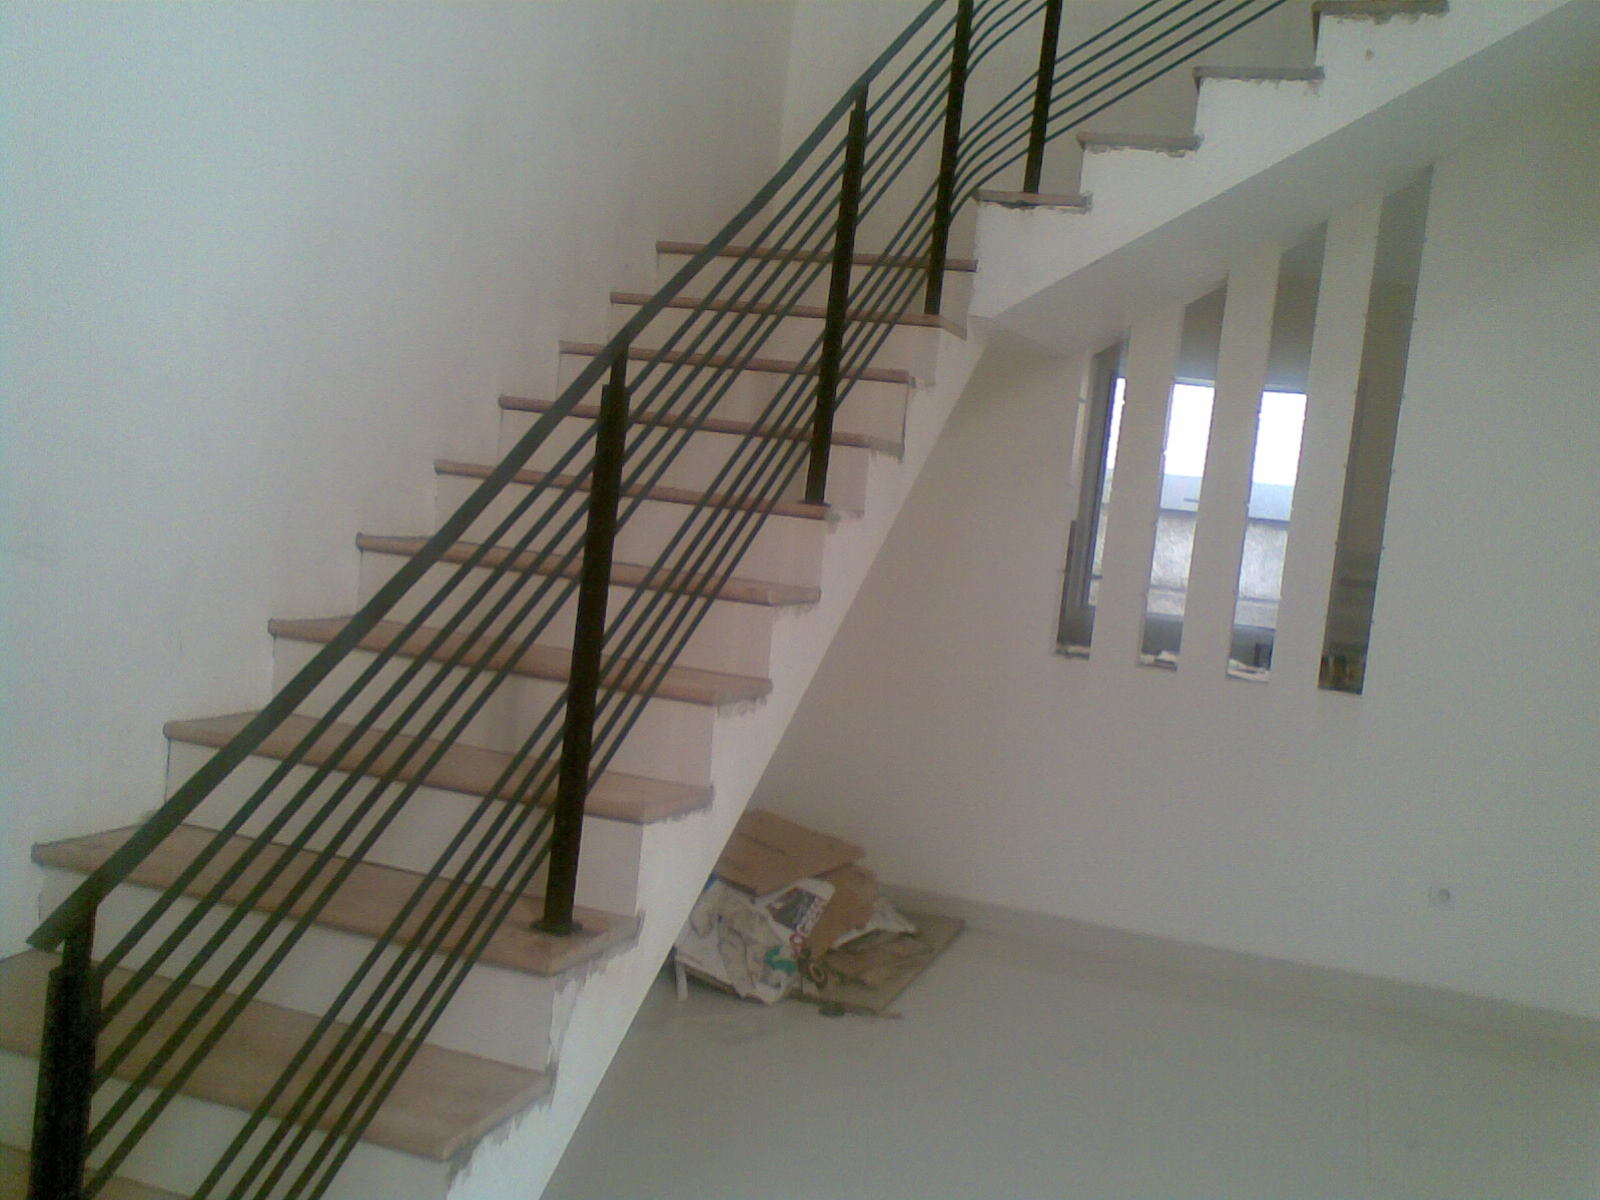 Pabrik Pagar Beton Bagus Hubungi Wa 082218137048 Tempat